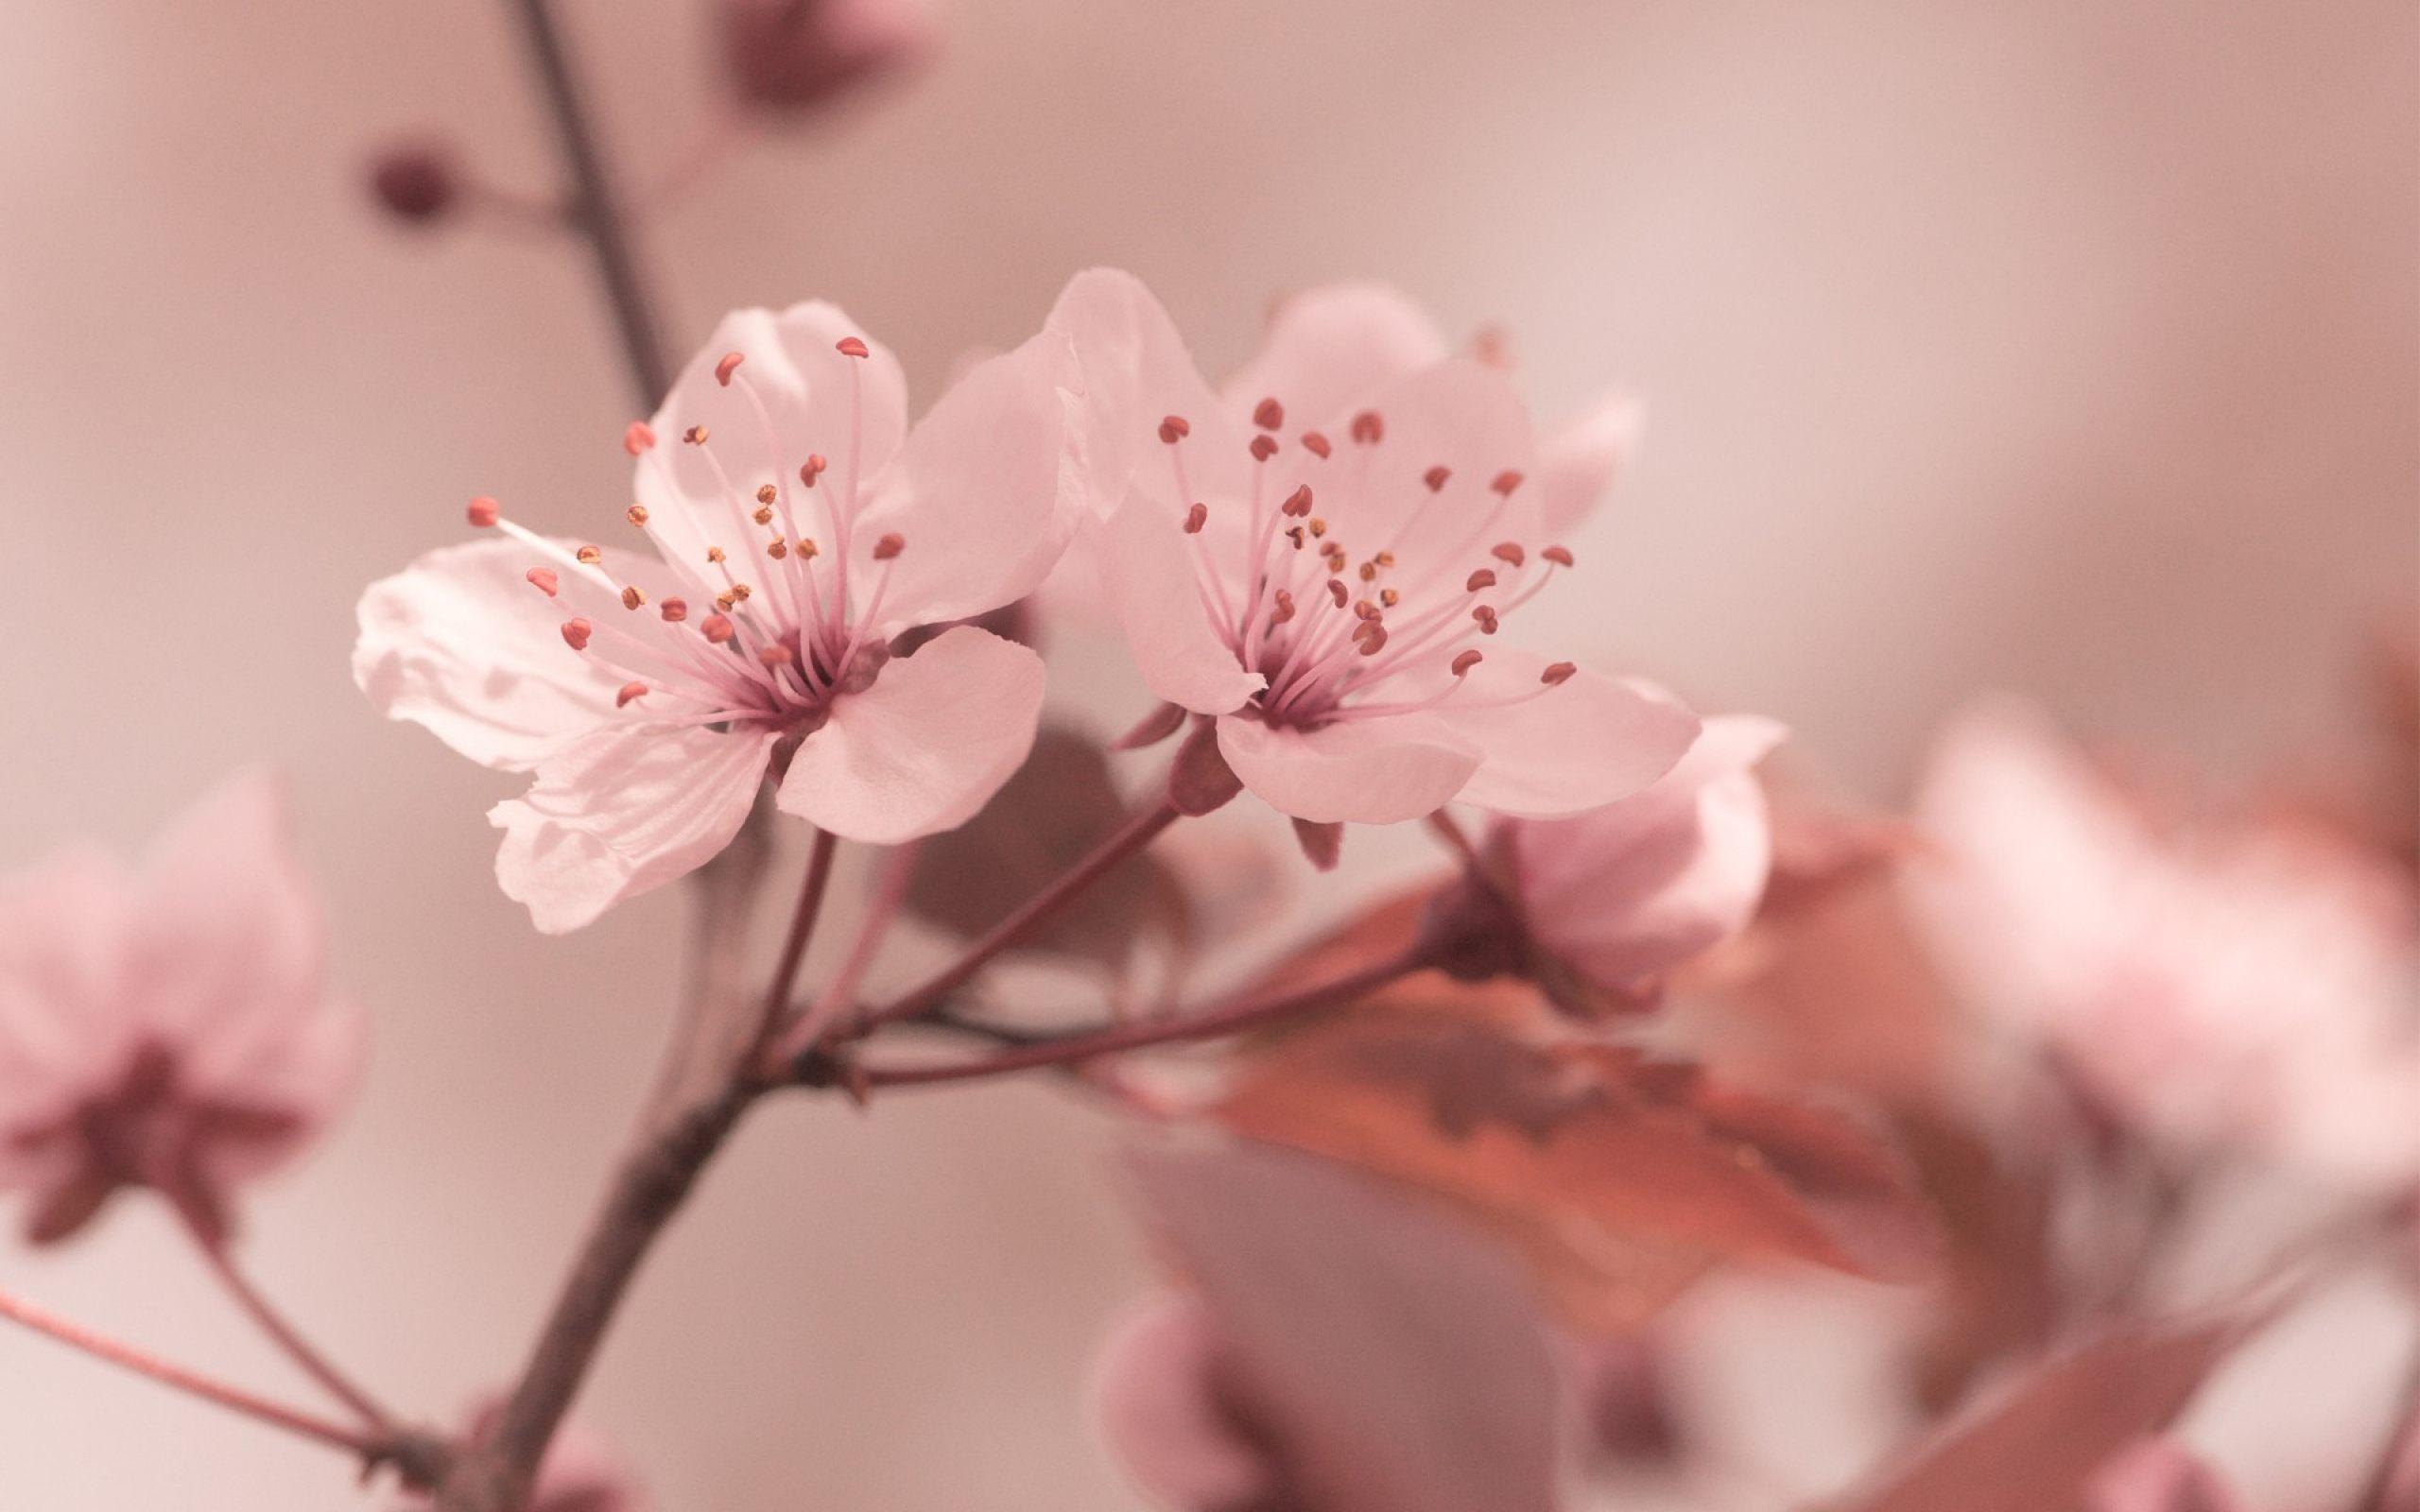 Sakura Flower Hd Wallpapers 7wallpapers Net